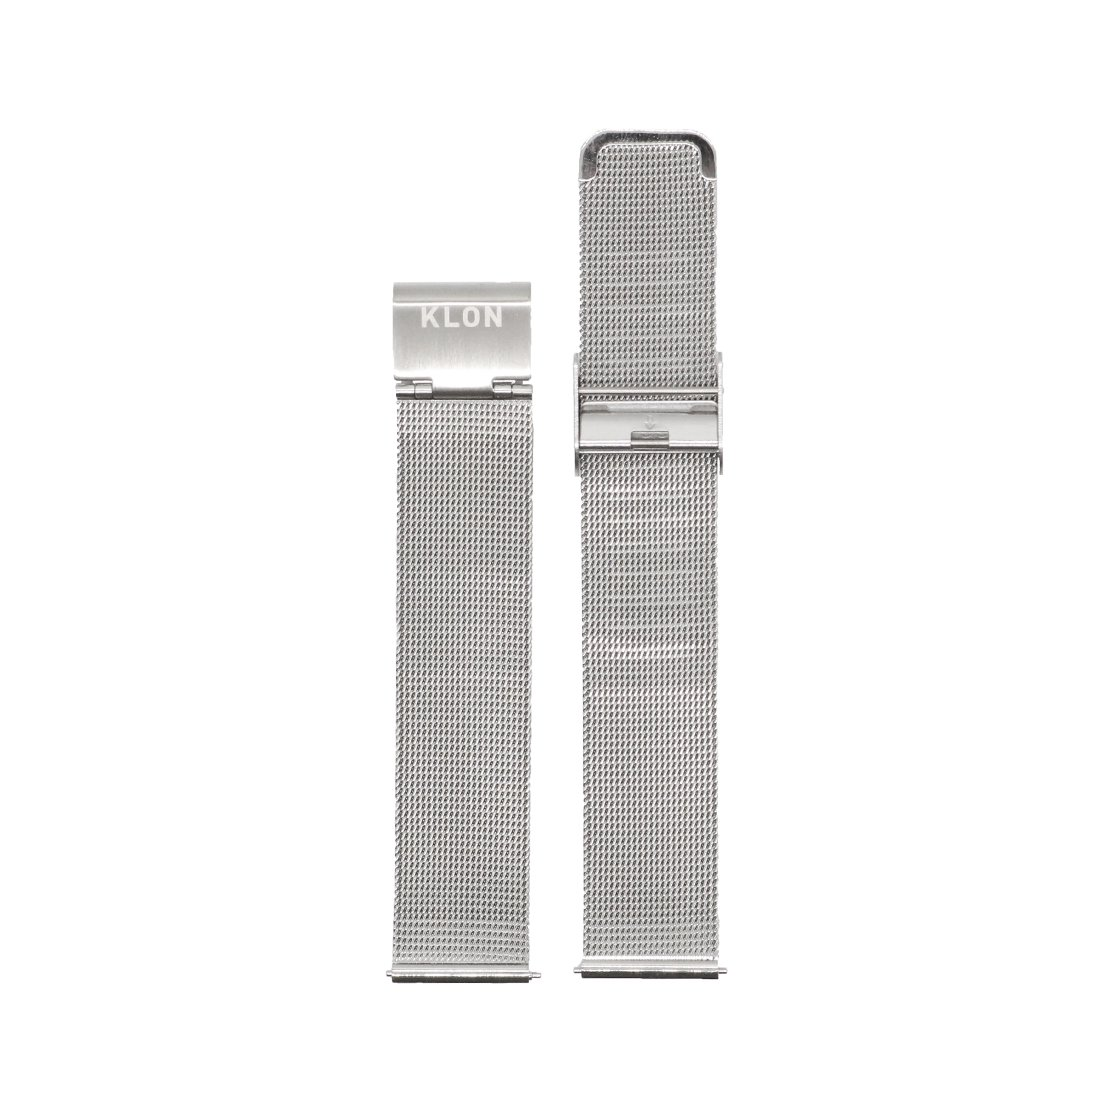 KLON WATCH REPLACEMENT STRAP -SILVER MESH- 18mm